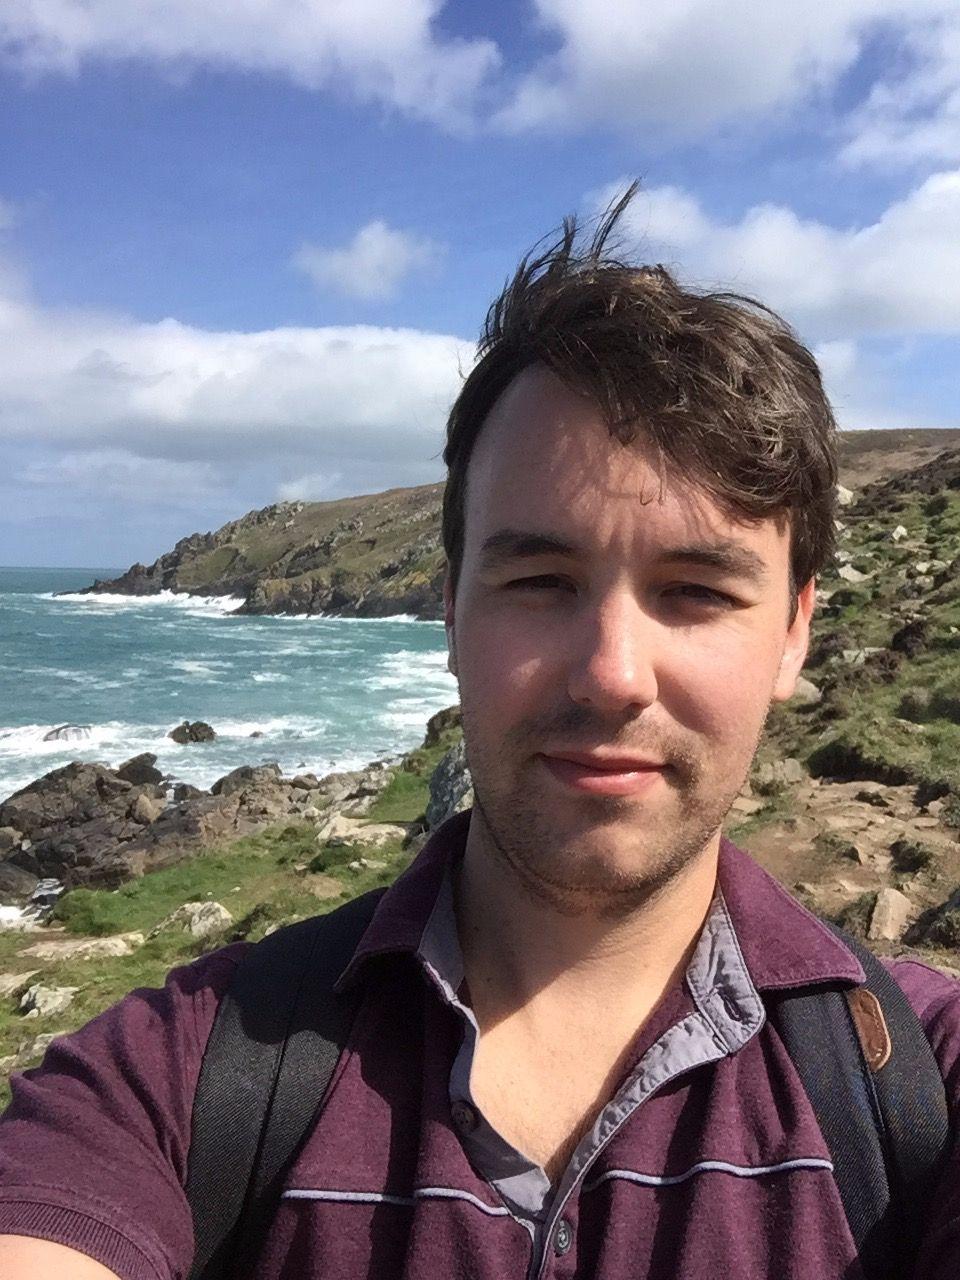 Ruby on Rails4 mentor, Ruby on Rails4 expert, Ruby on Rails4 code help